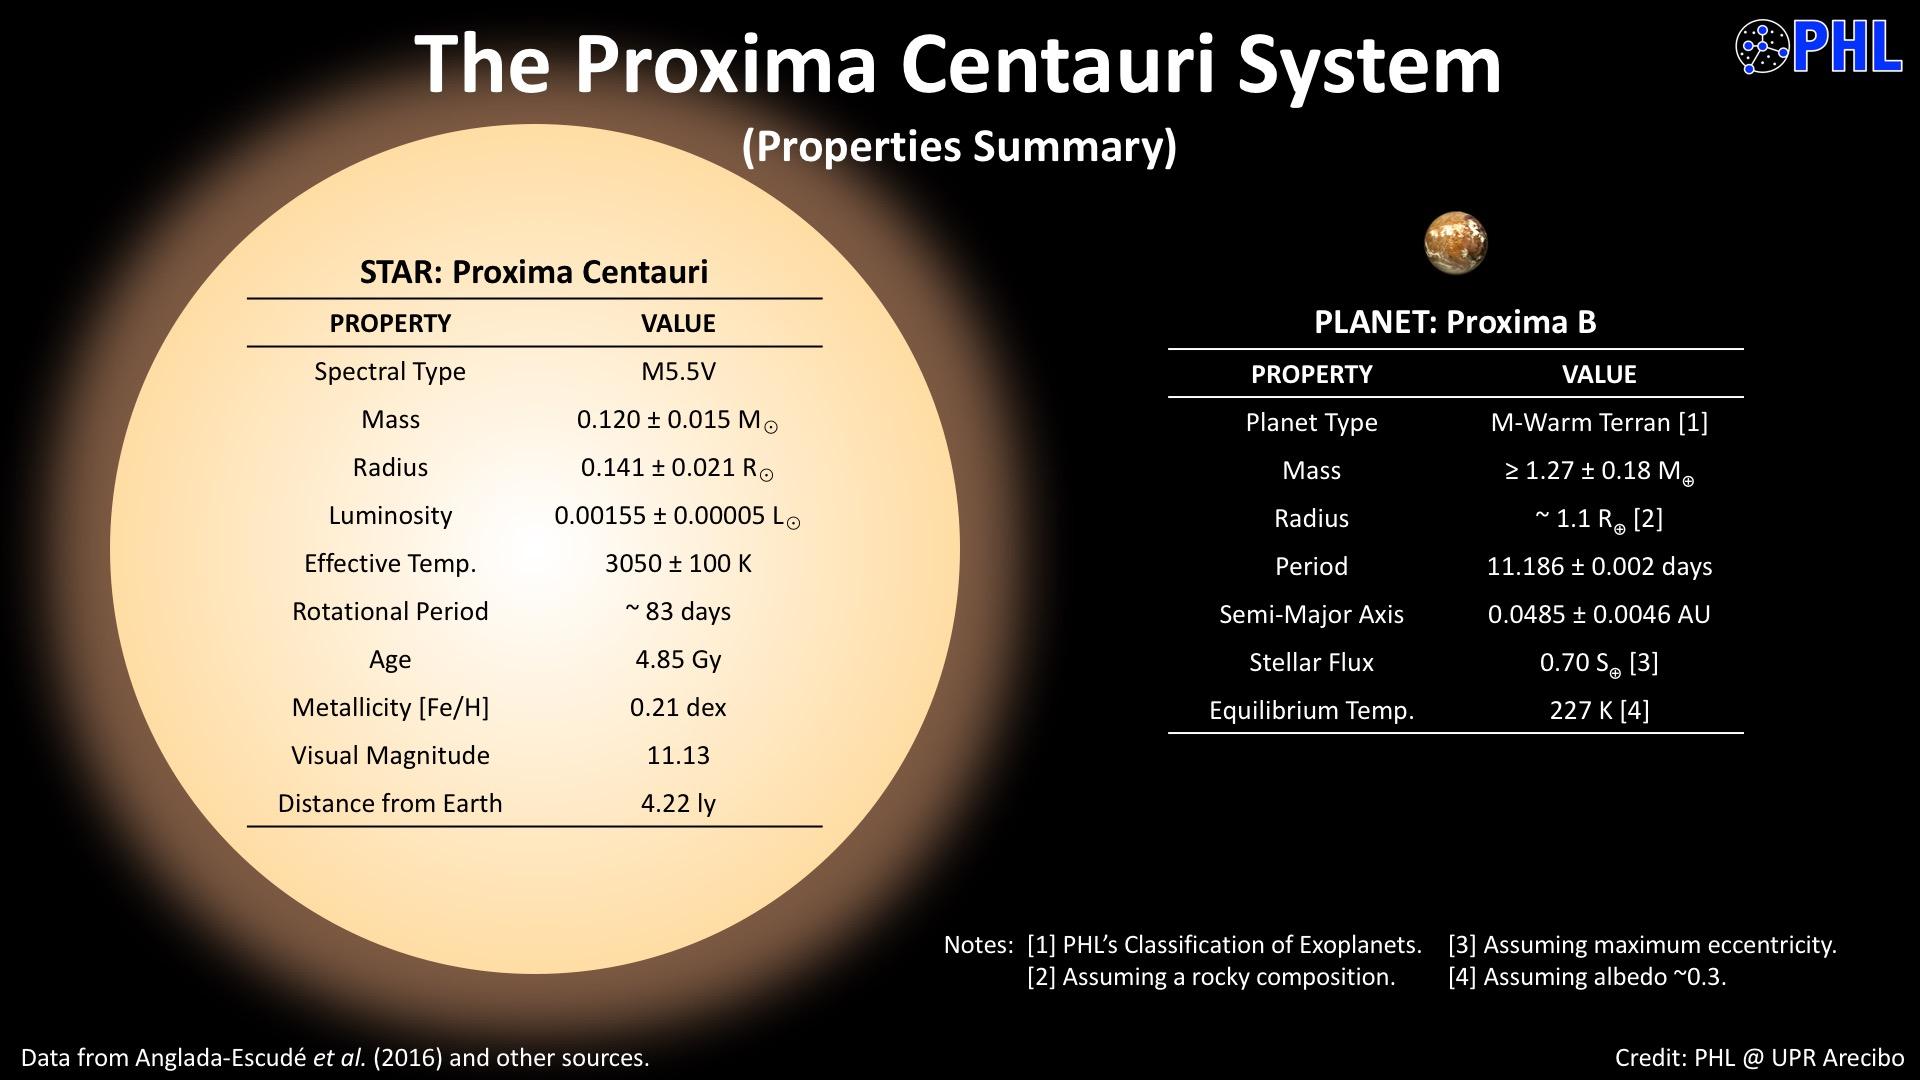 http://www.hpcf.upr.edu/~abel/phl/proxb/images/proxima_system.jpg